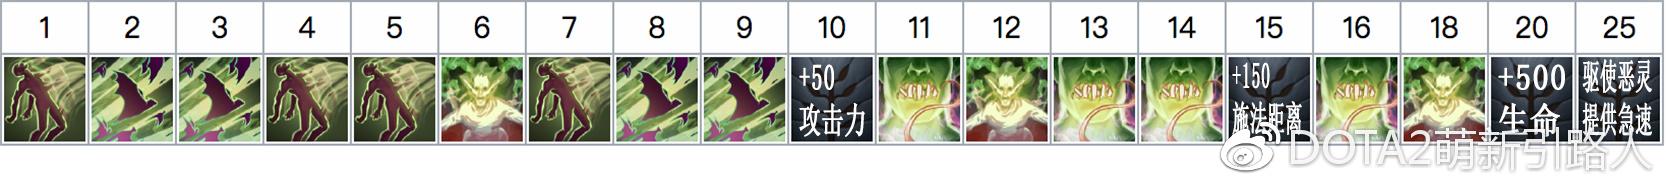 DOTA2月夜枫:【DOTA2萌新入门——英雄篇】死亡先知